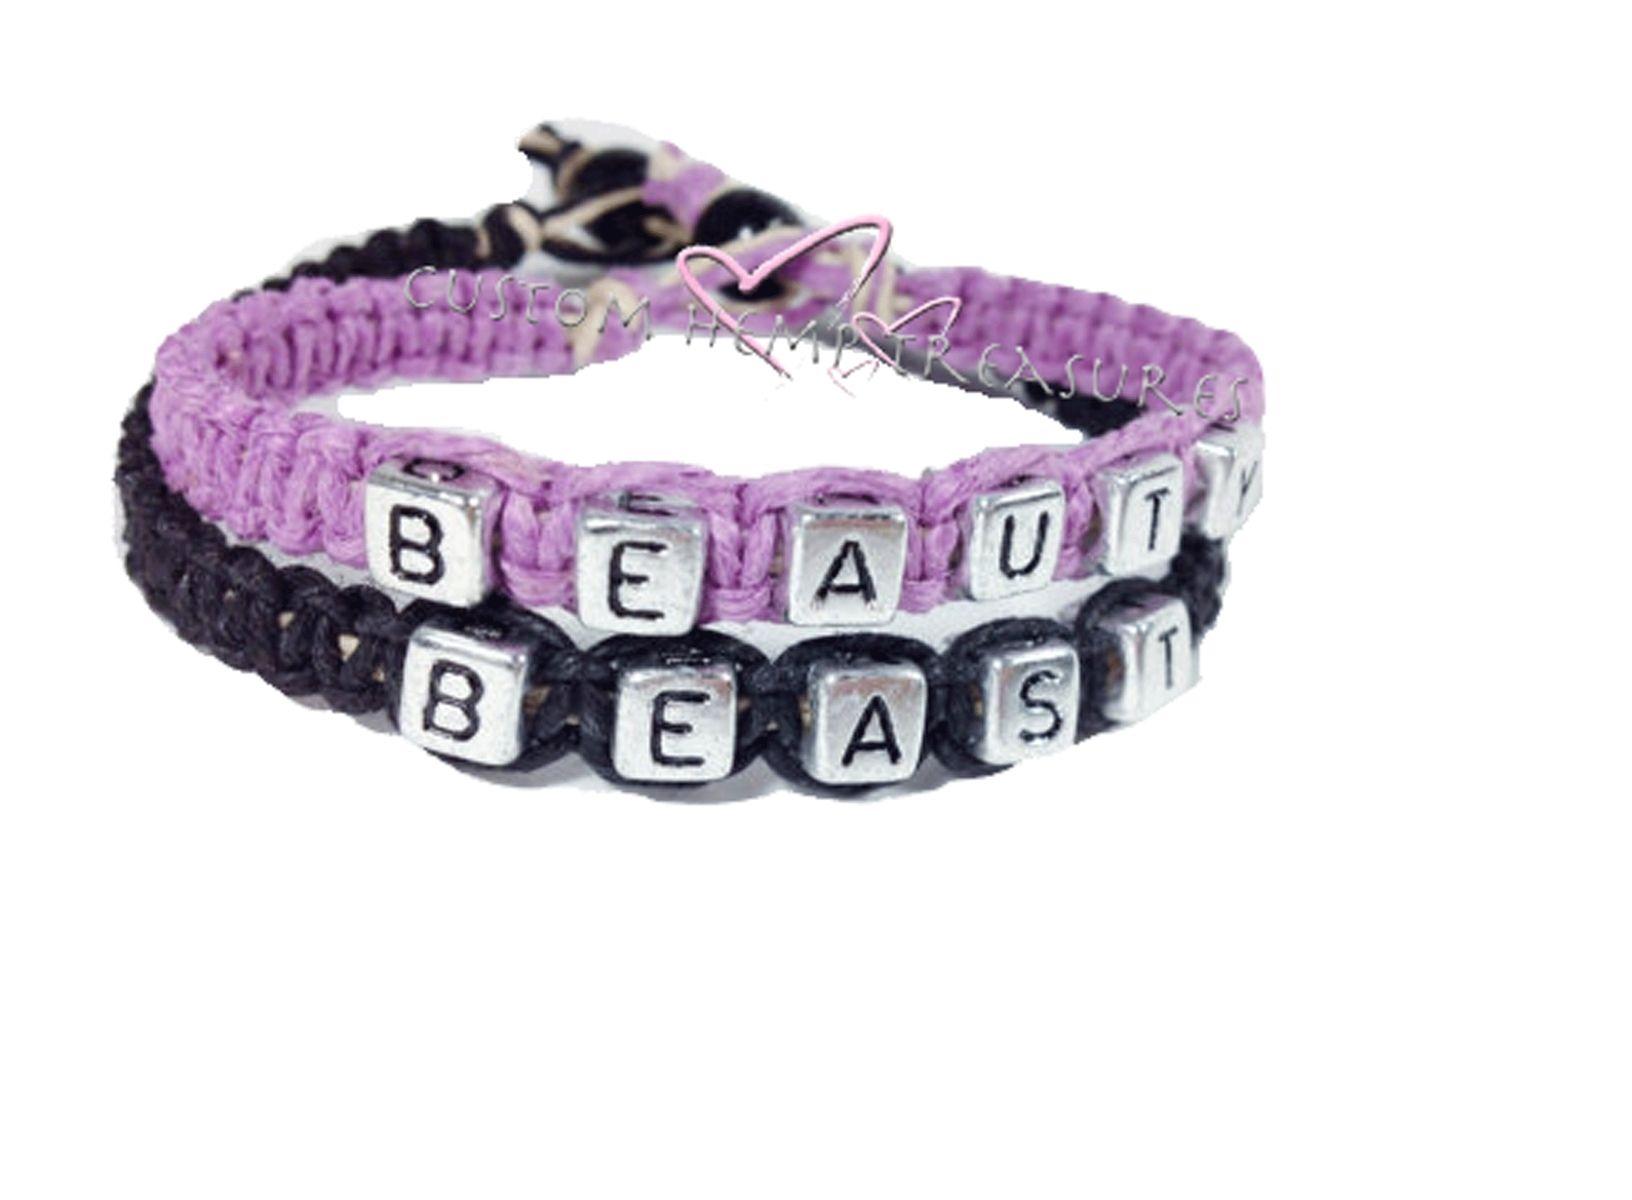 Buy Handmade Beauty Beast Couples Bracelets Personalized Bracelets ...